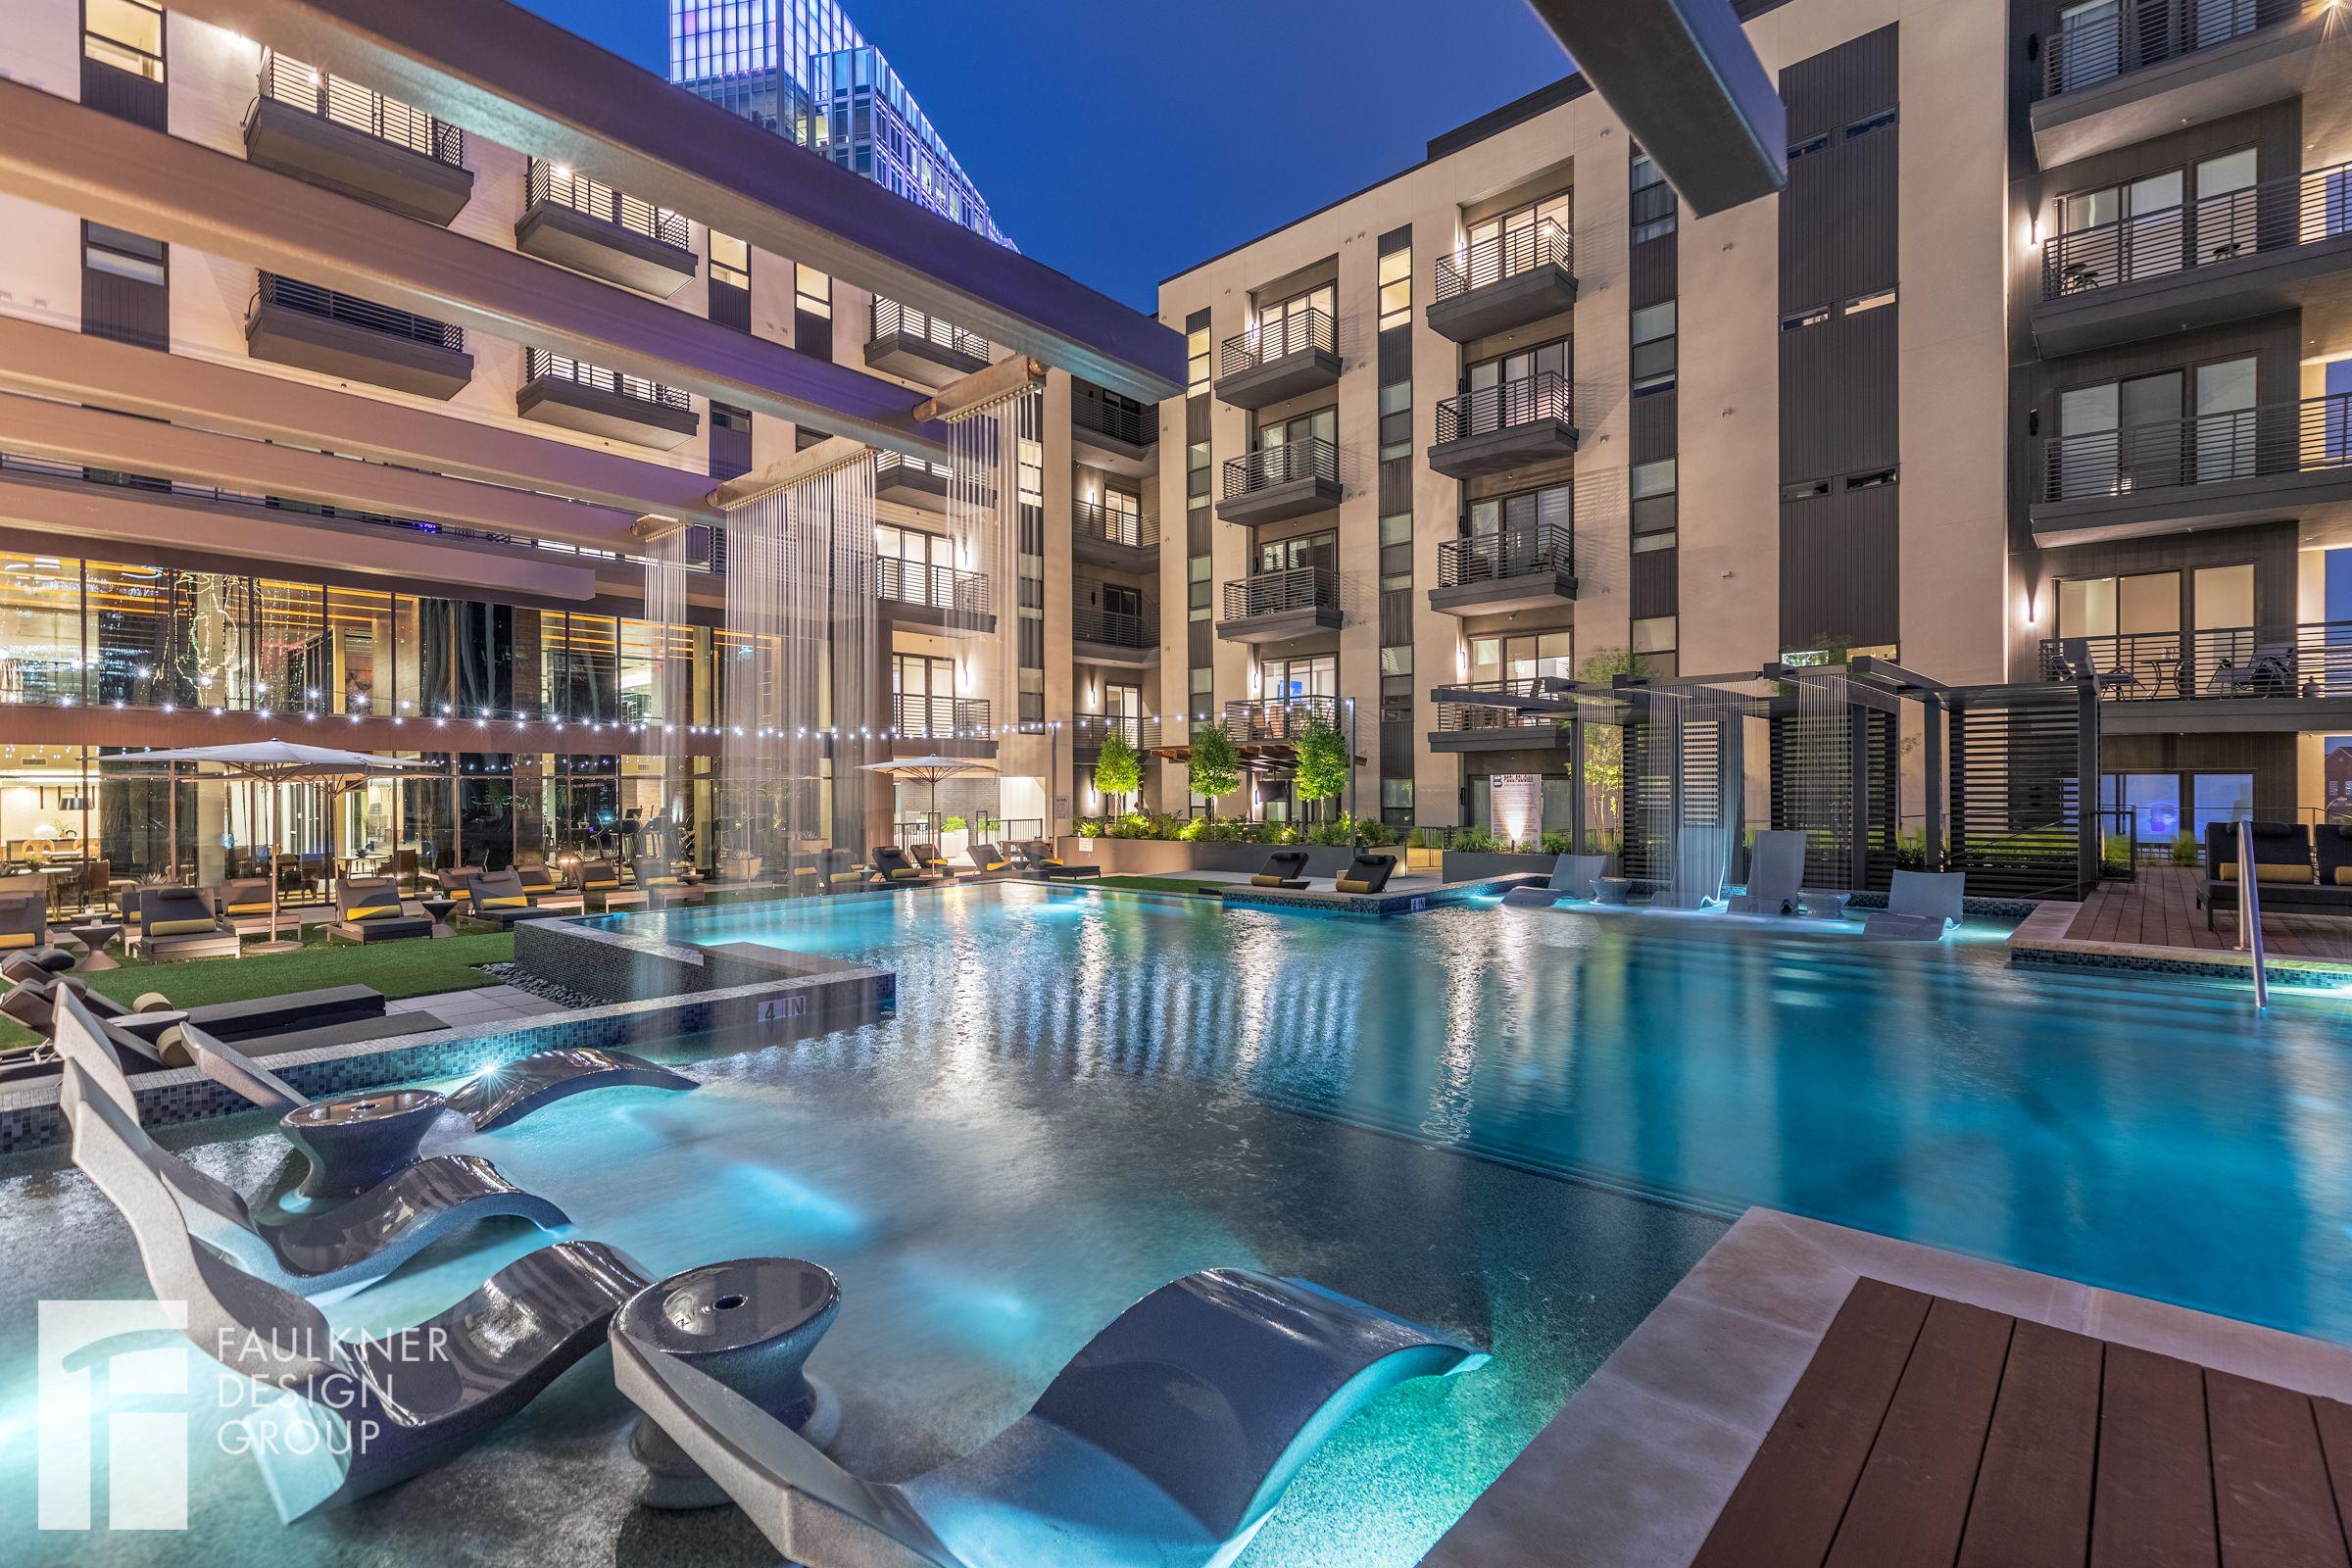 Designed By Faulkner Design Group Infinitypool Resortstylepool Luxurydeck Outdoorlounge Lounger Luxury Apartments Resort Style Pool Texas Apartments